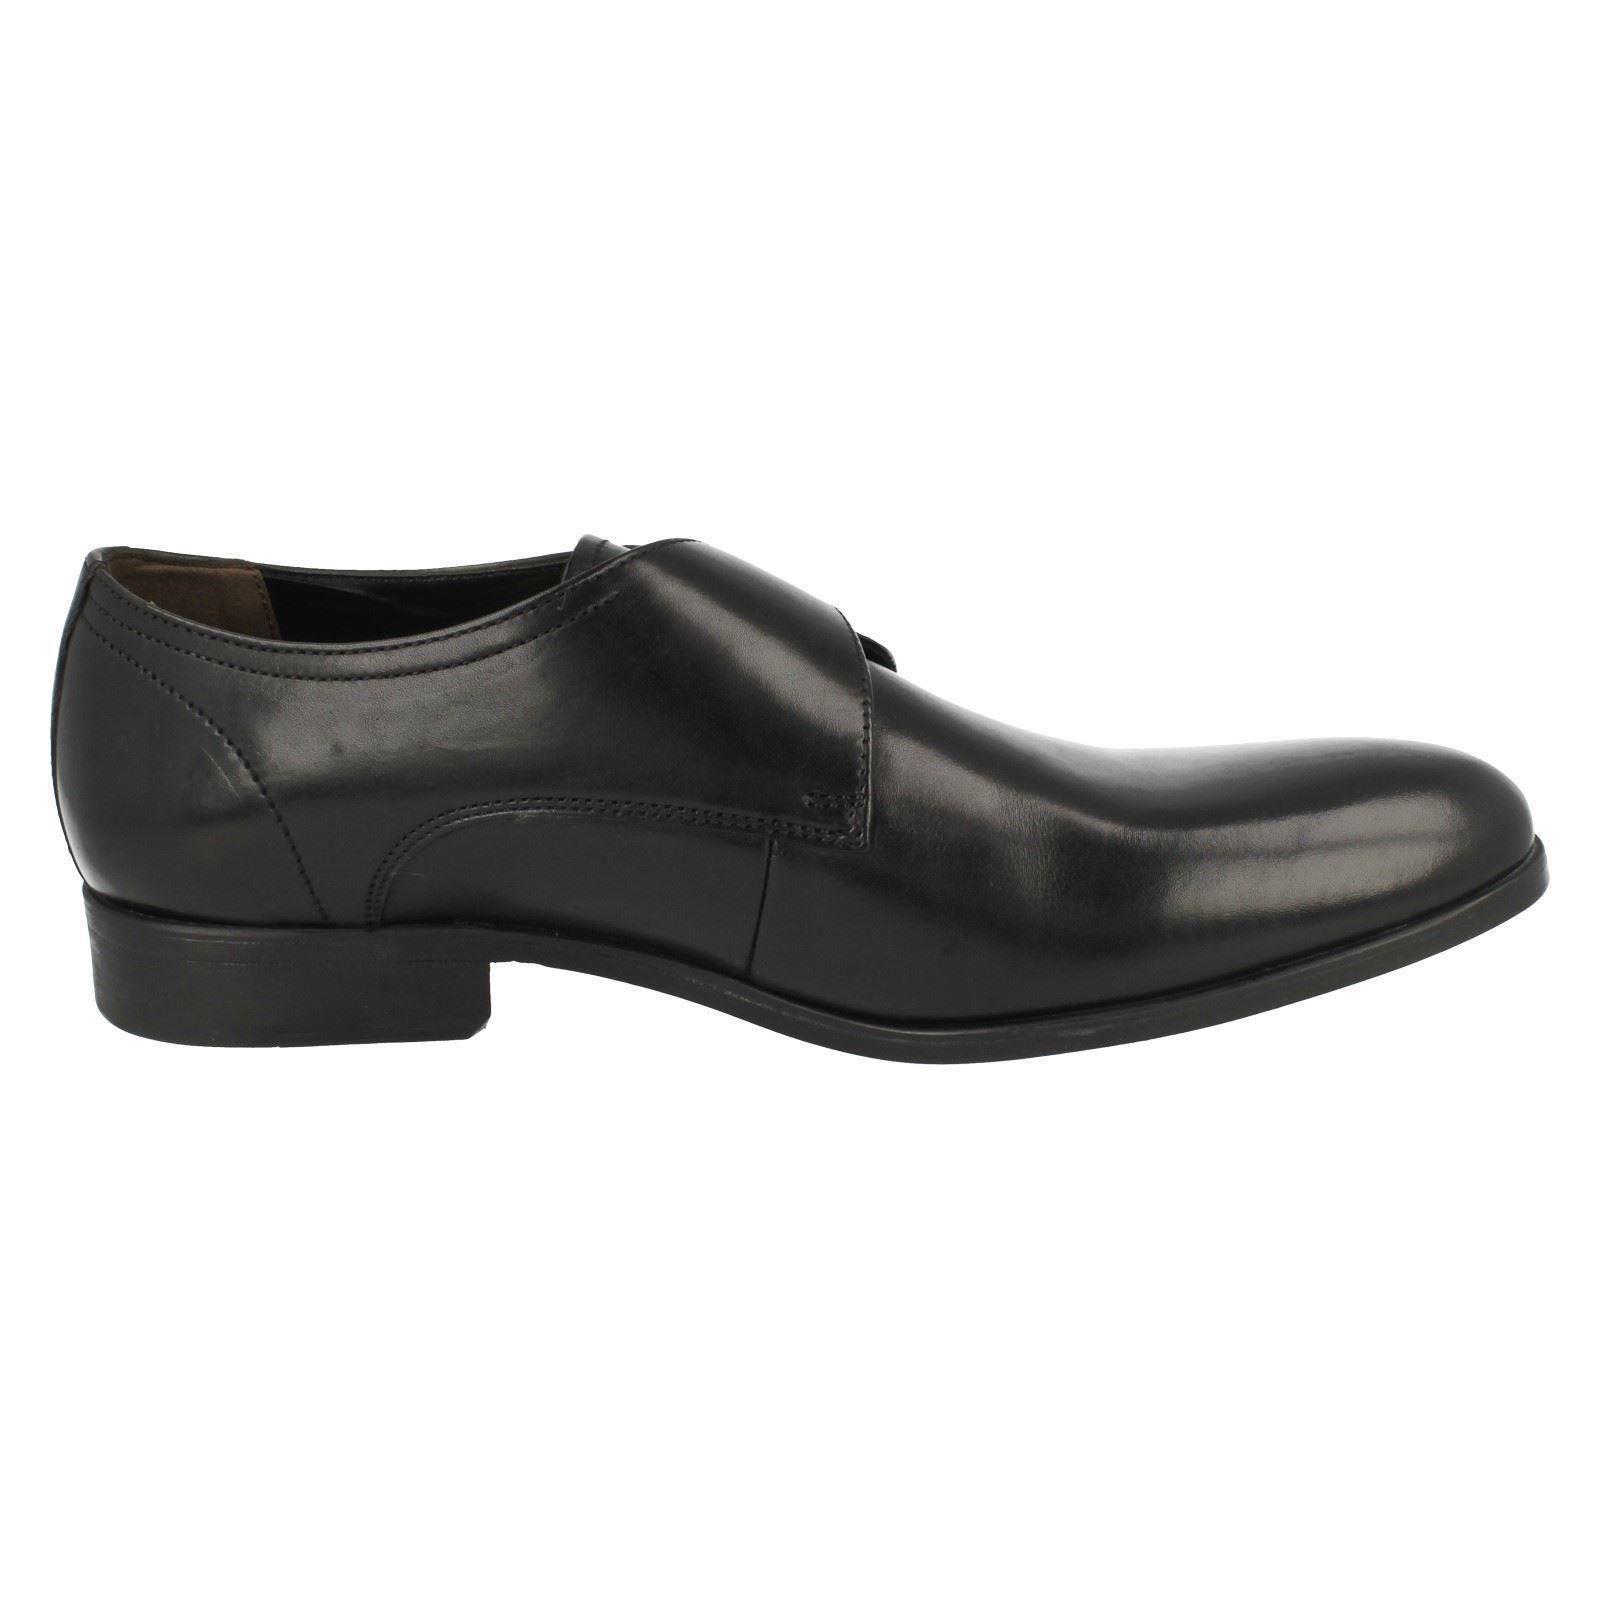 Hebilla Y Tira Monje Banfield Hombre Zapatos Clarks CPqw77